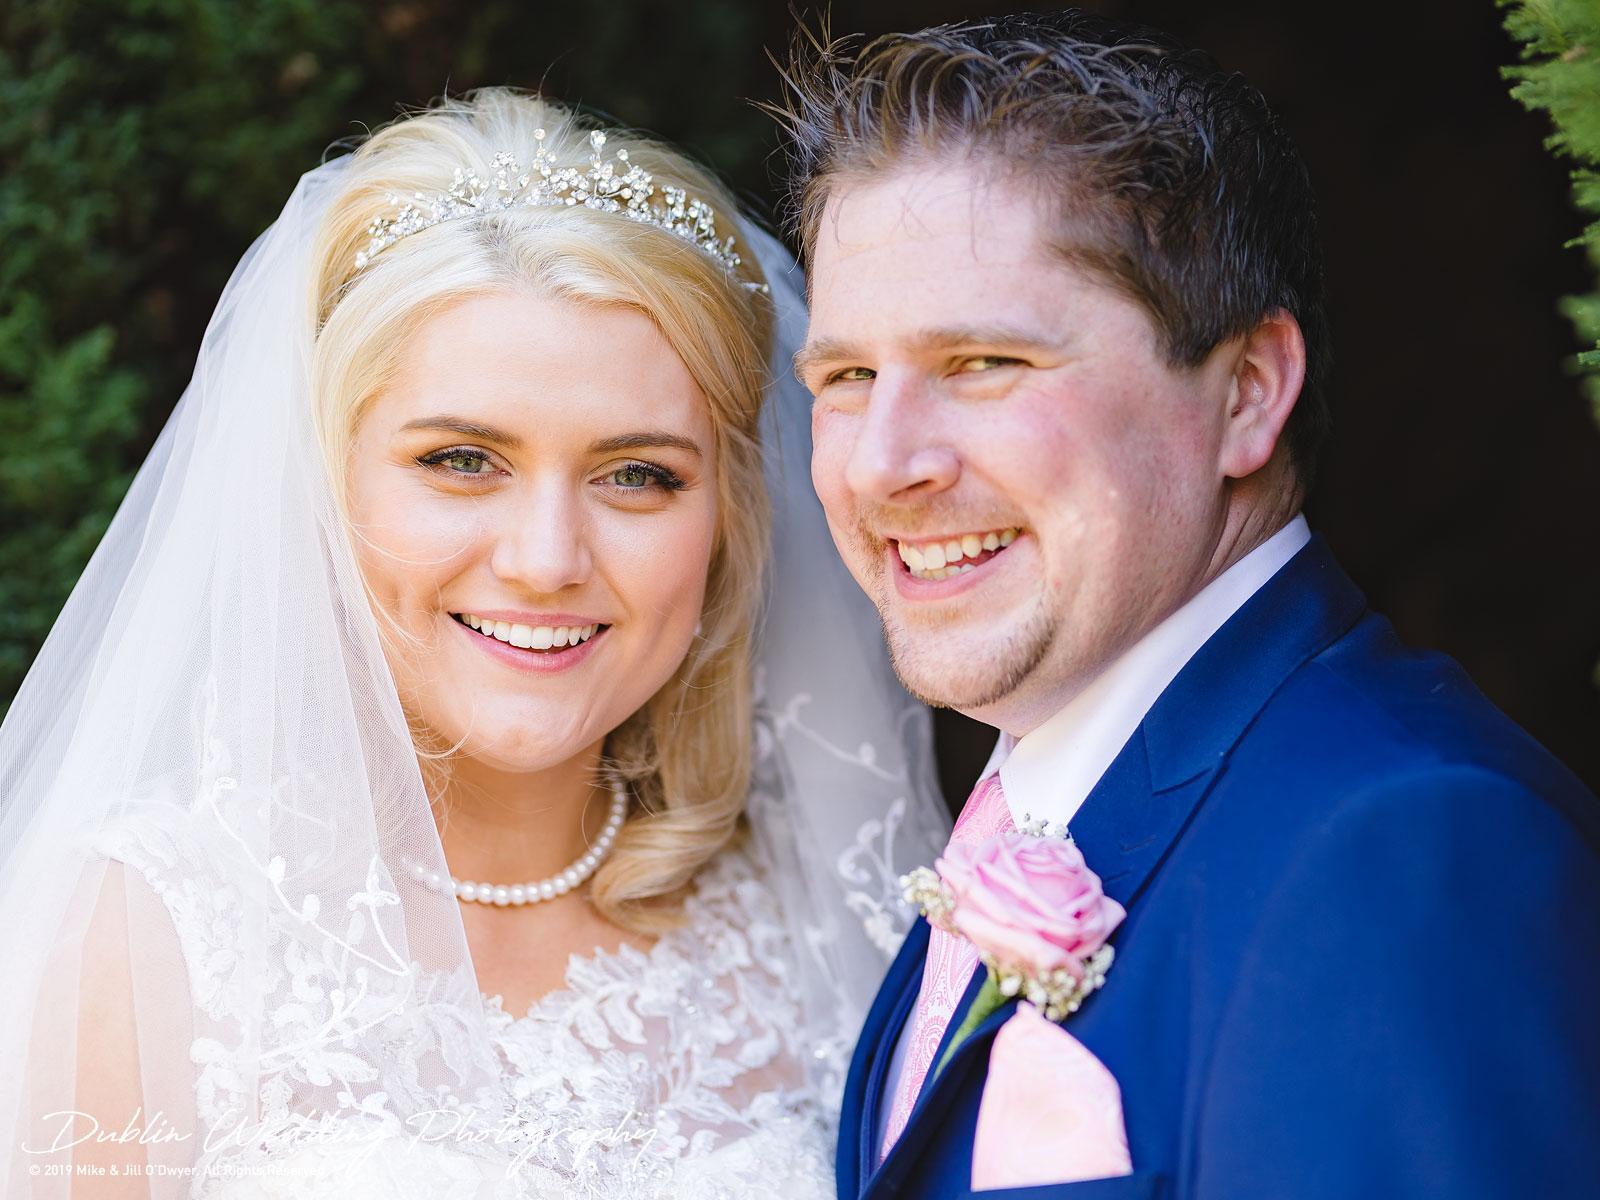 wedding-photographer-wicklow-glenview-hotel-KS039.jpg